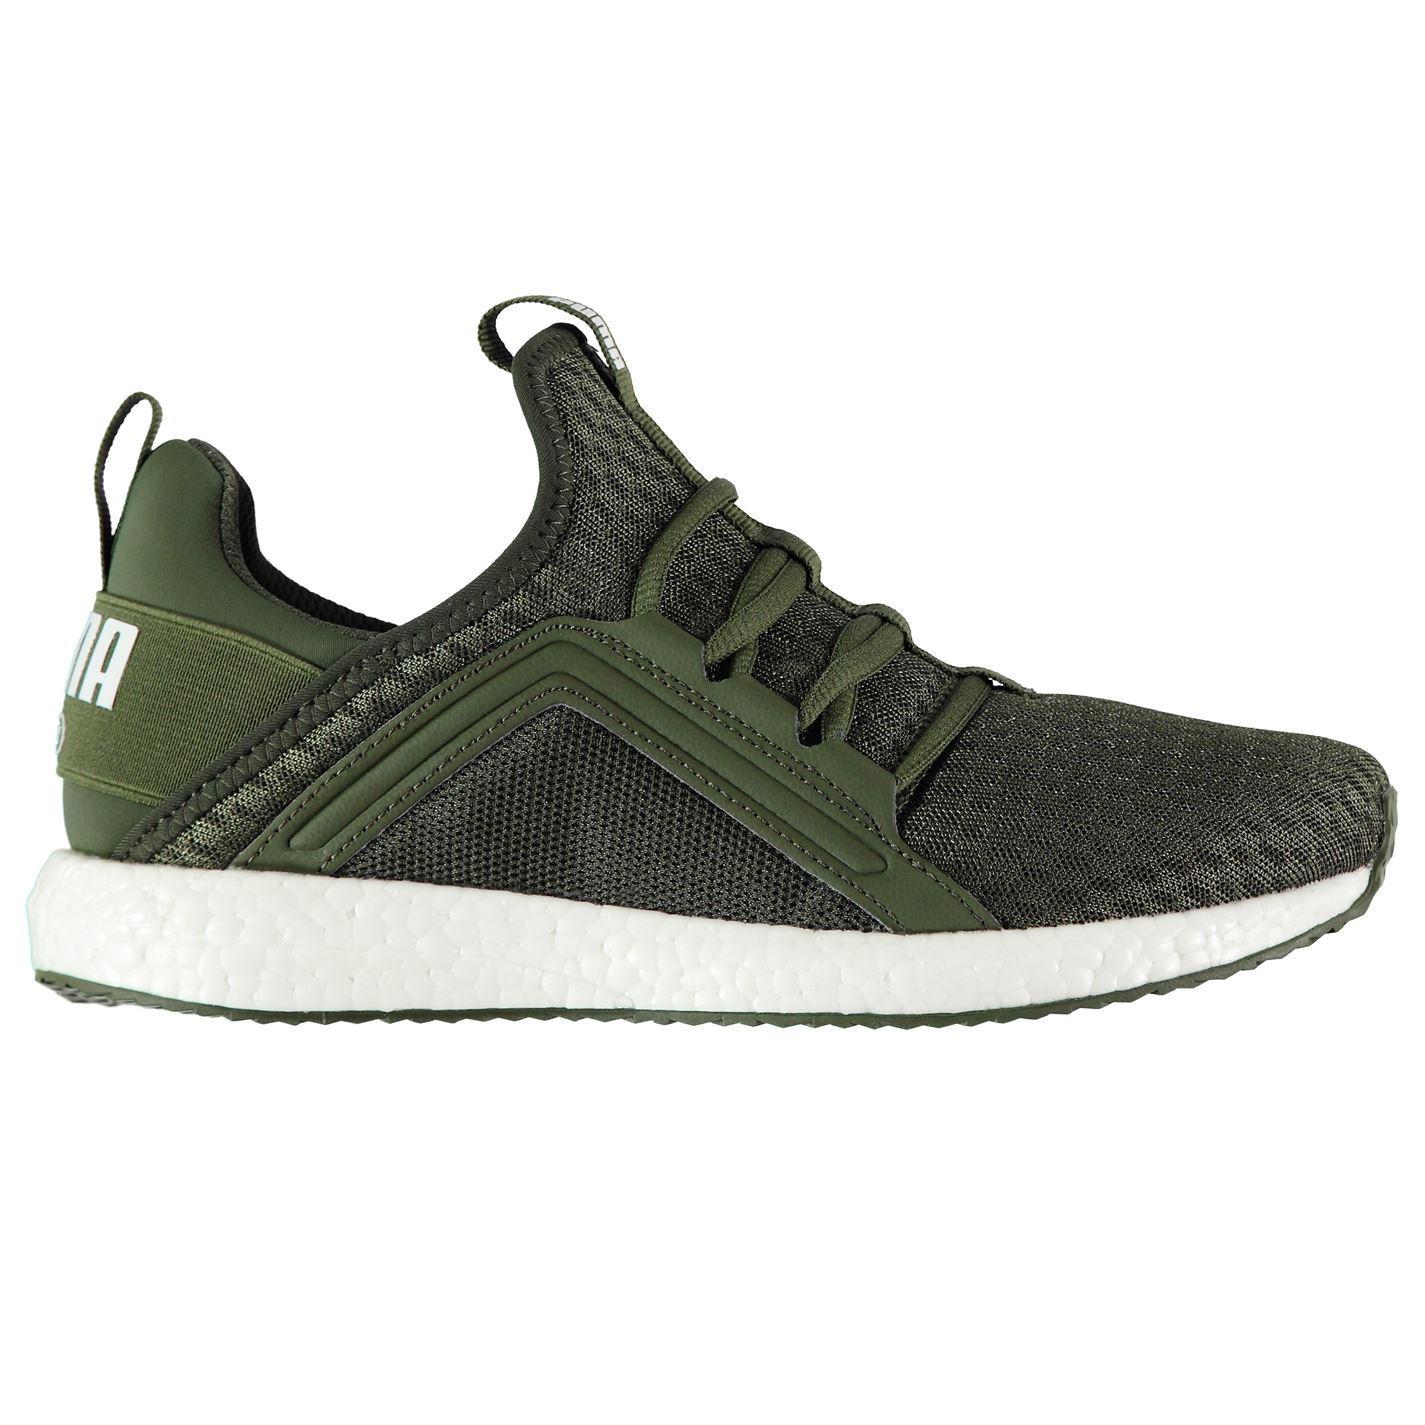 342644883bd902 ... Puma Mega NRGY Running Shoes Womens Green Run Jogging Trainers Sneakers  ...